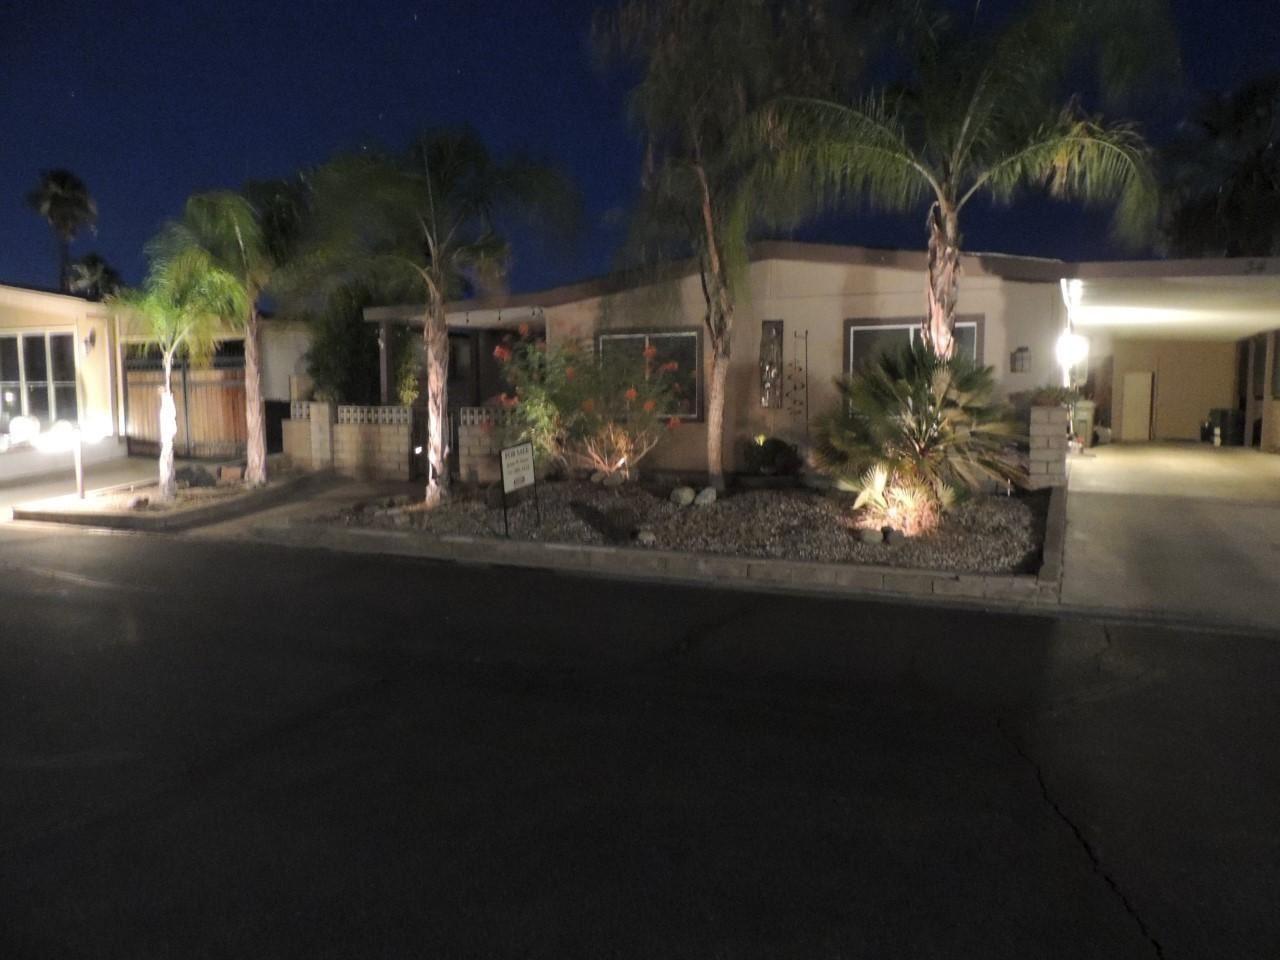 34 International Boulevard, Rancho Mirage, CA 92270 - MLS#: 219044275